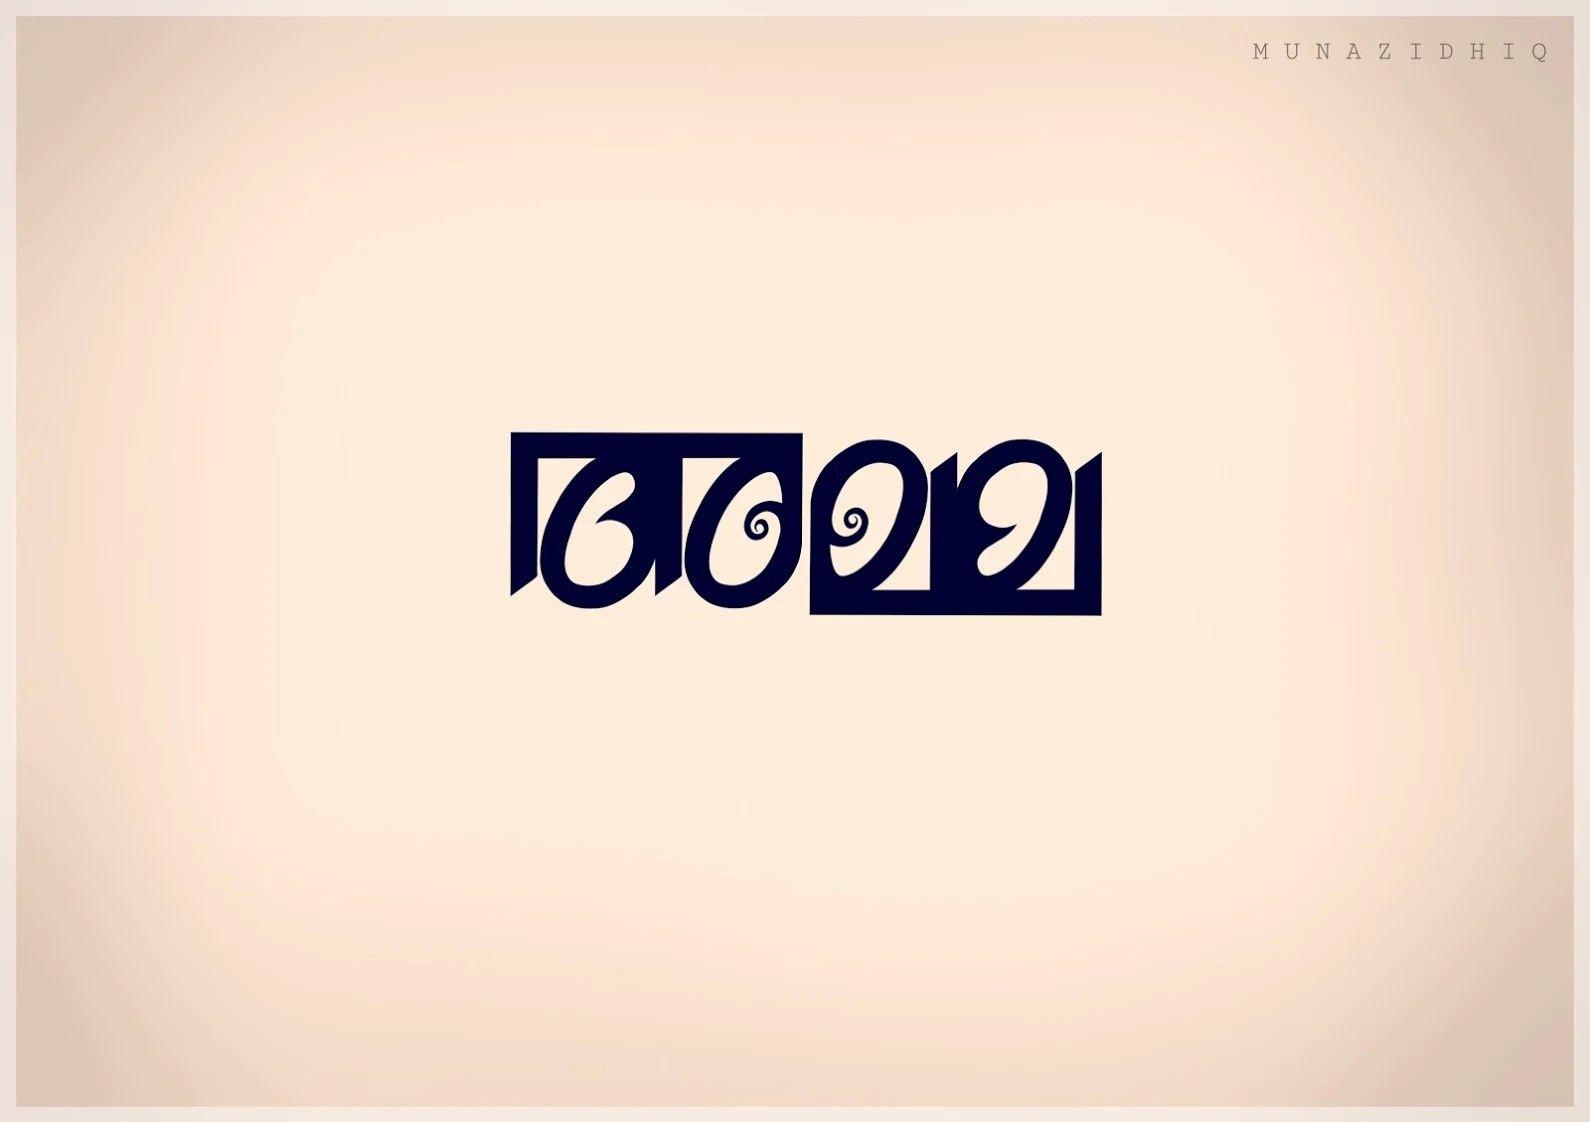 Malayalam Ambigram Amma മലയാളം ആംബിഗ്രാം അമ്മ, mother തല